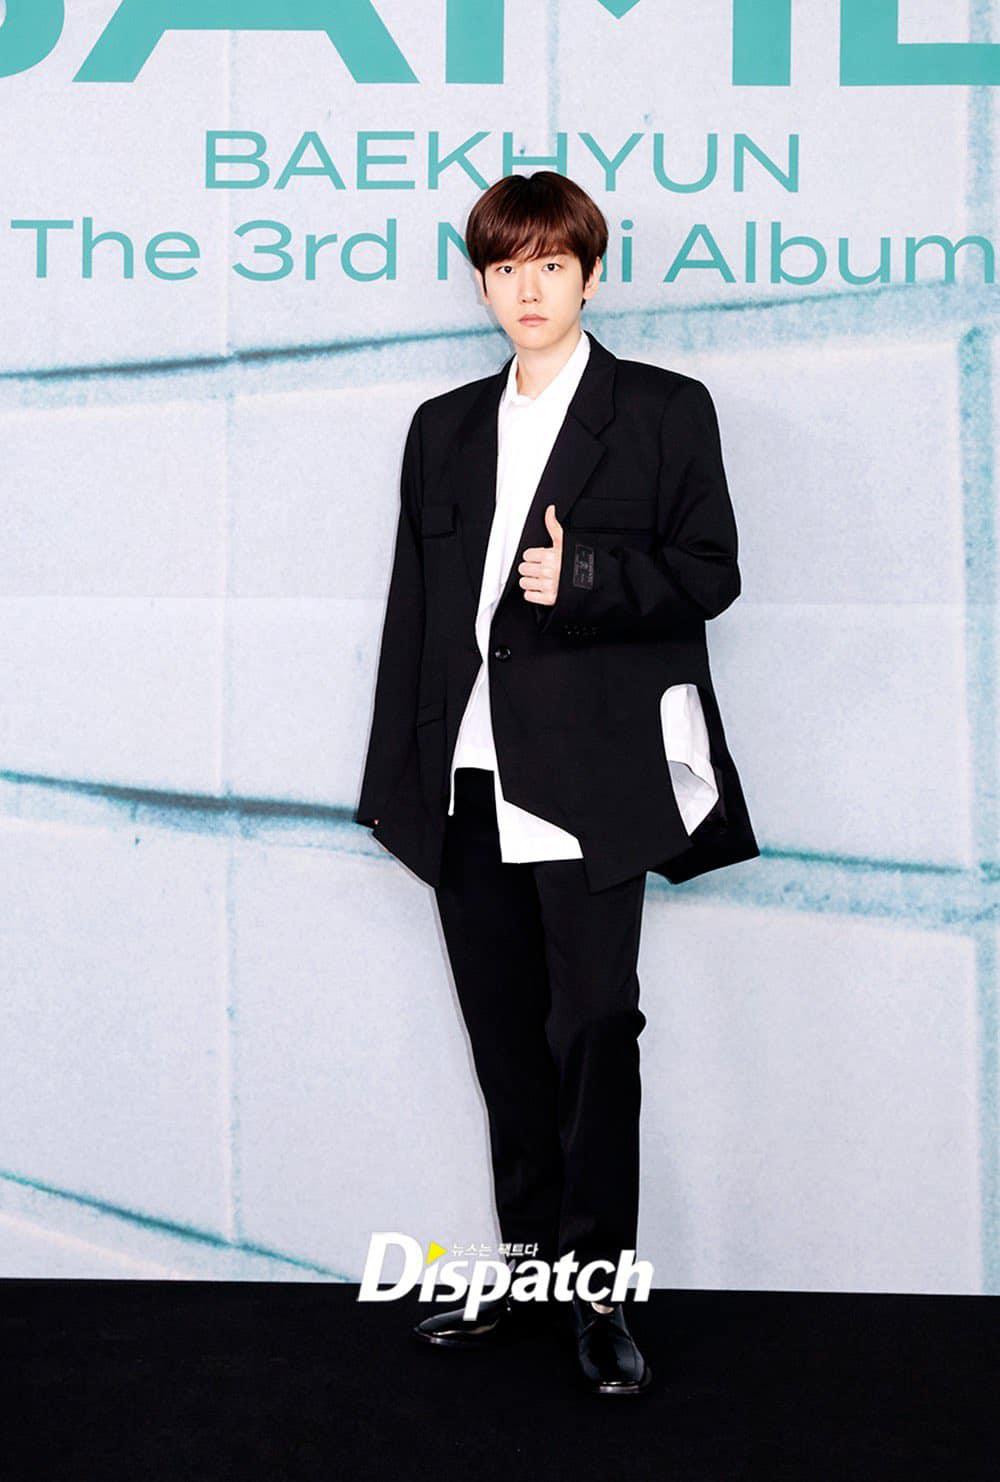 exo-baekhyun-achieves-over-760000-copies-sold-for-3rd-mini-album-bambi-on-hanteo-chart